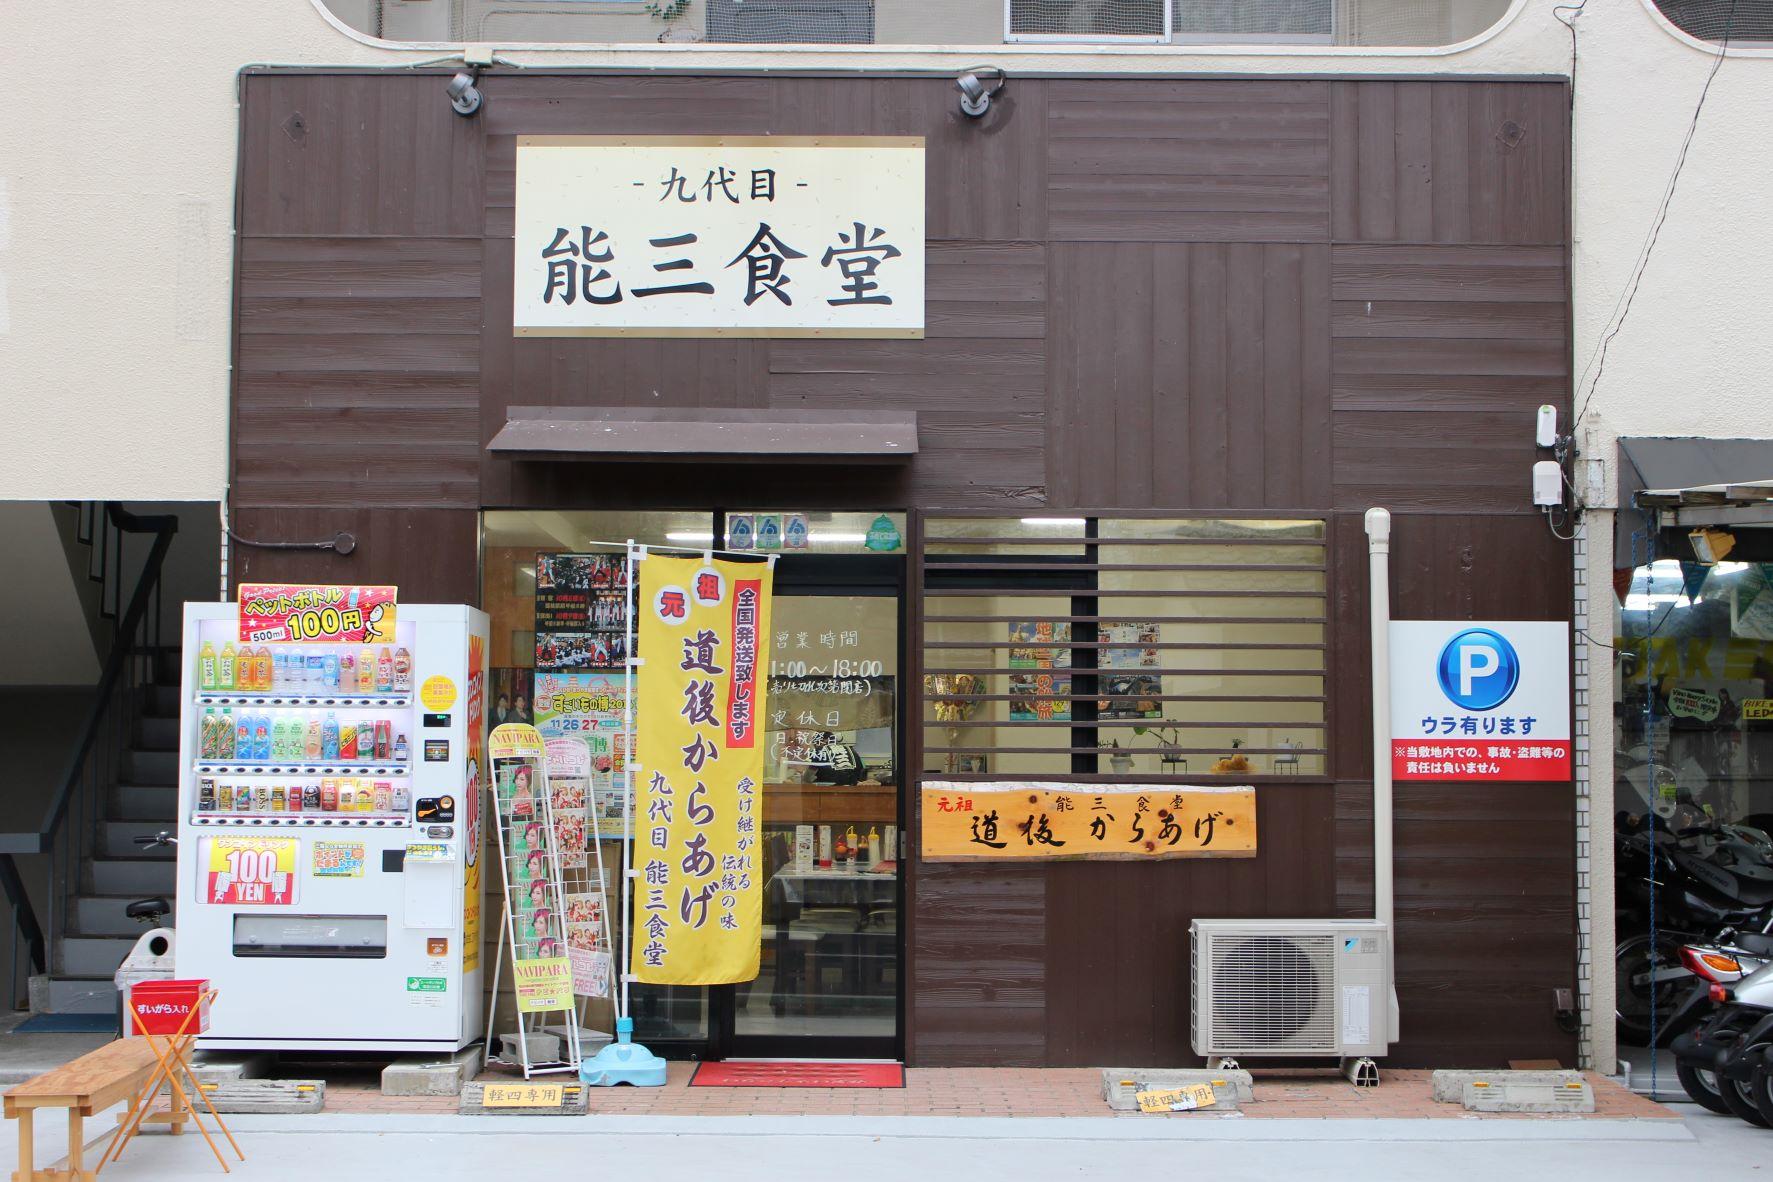 【Vol.33掲載 九代目能三食堂様よりお盆休み変更のお知らせ】